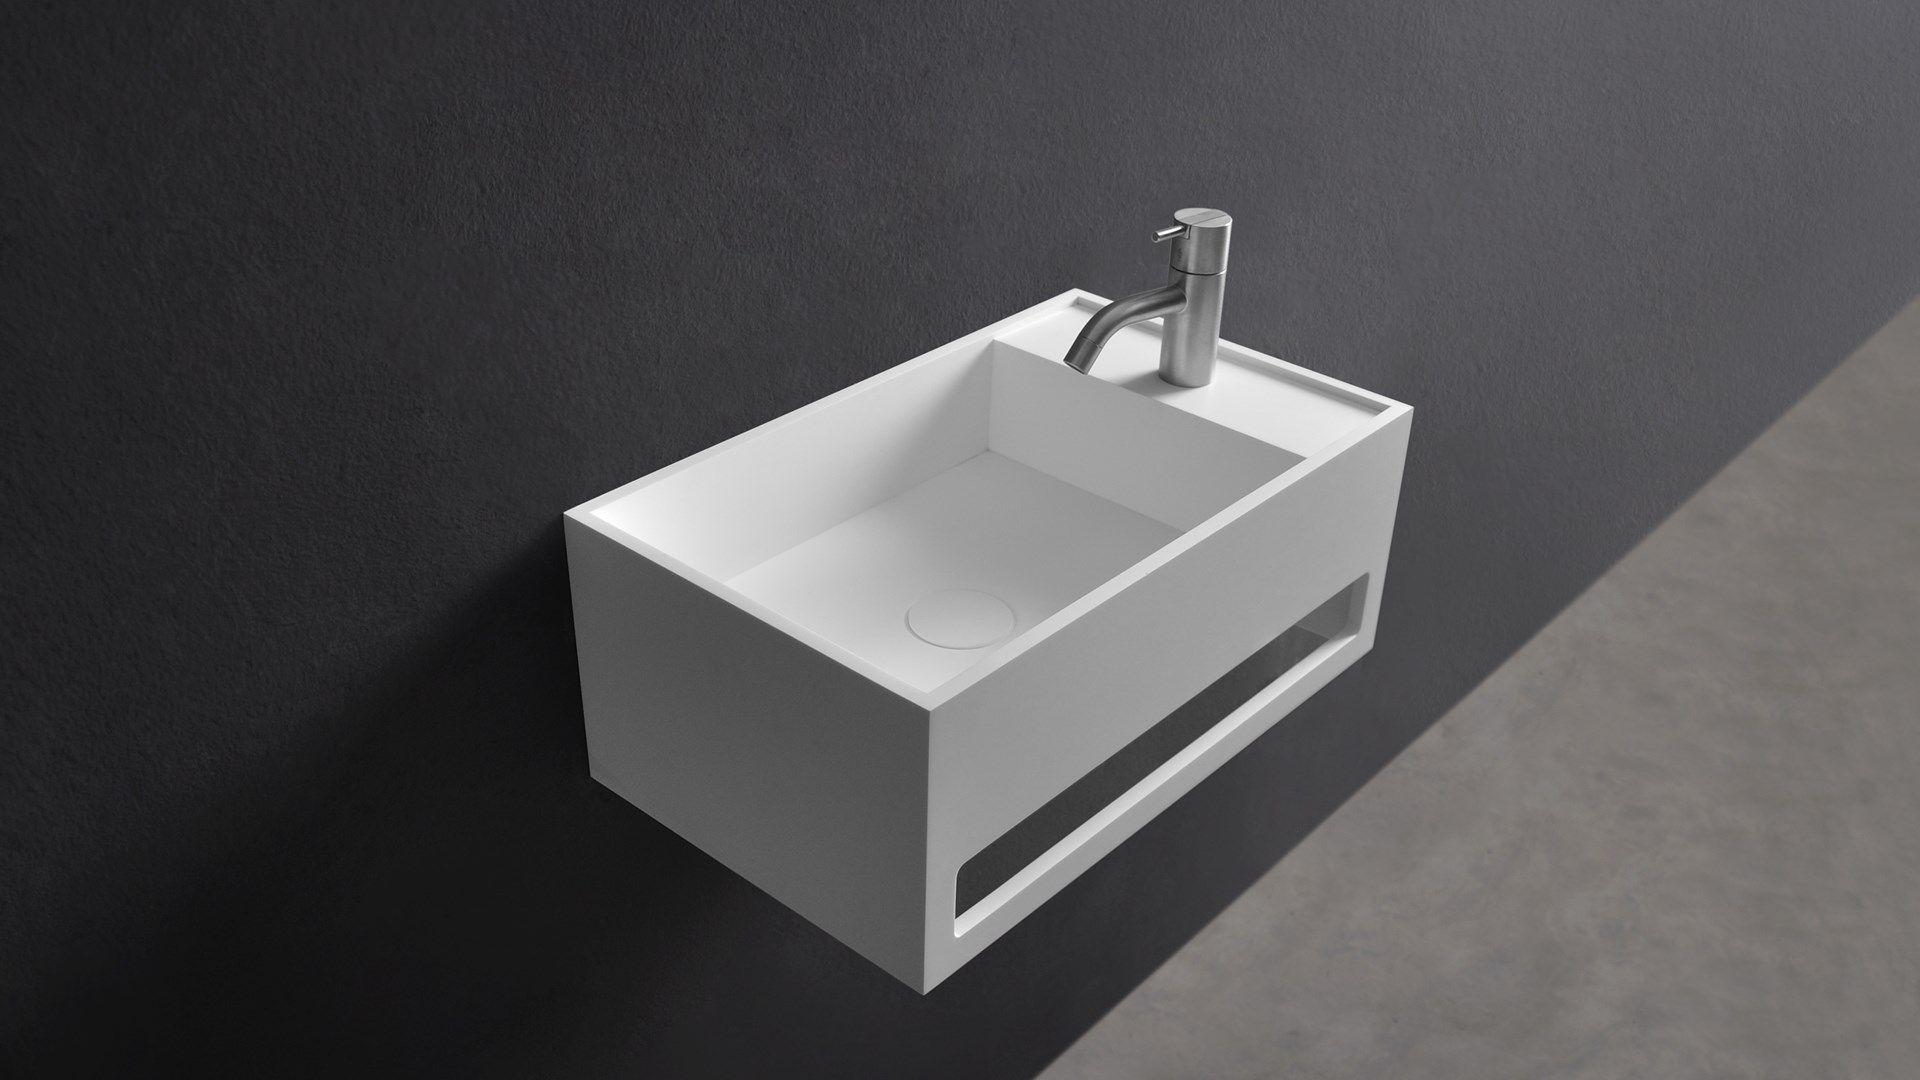 Solid Surface Badkamer : Badkamer wastafel kopen ladekast badkamer cool ladekast mat wit